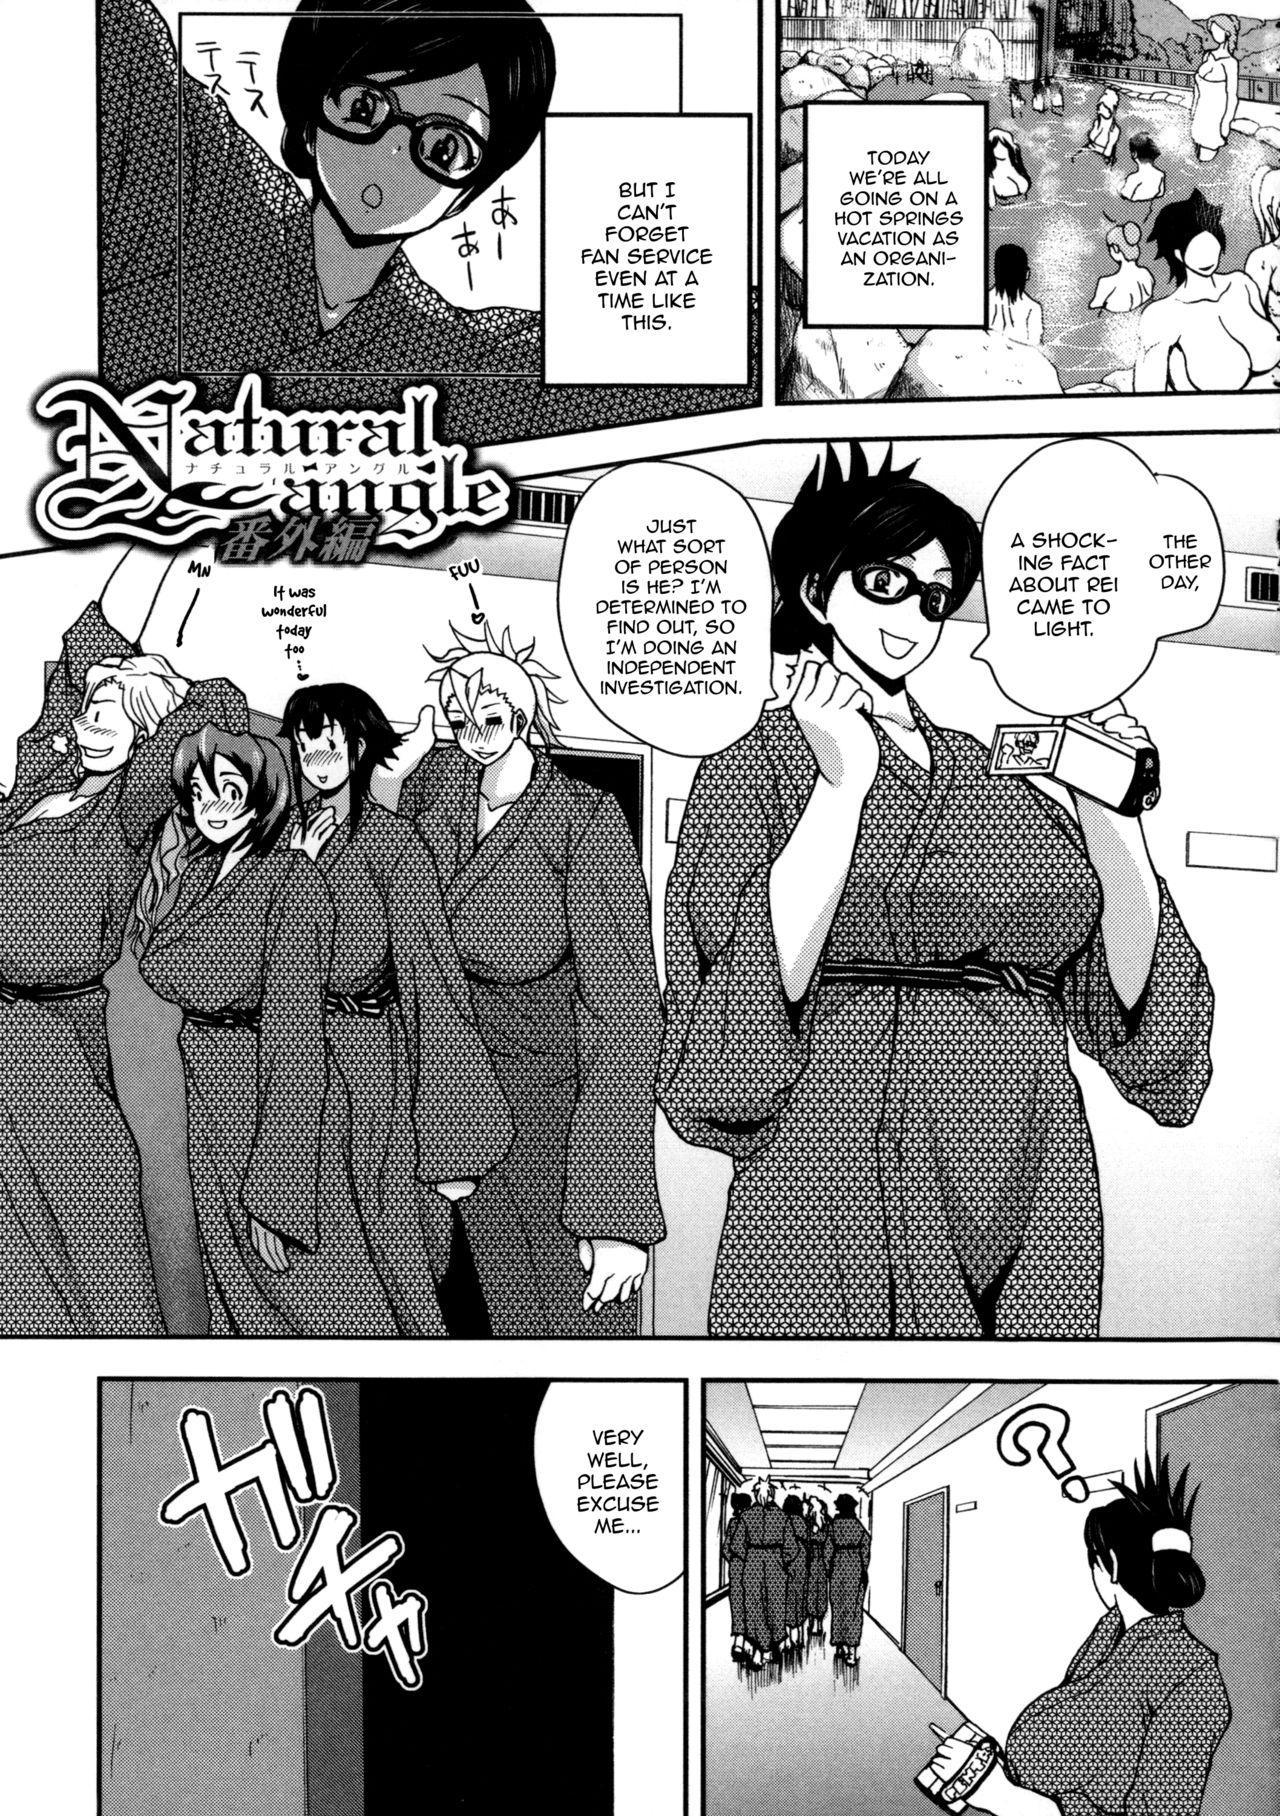 [Yoshimura Tatsumaki] Monzetsu Taigatame ~Count 3 de Ikasete Ageru~ | Faint in Agony Bodylock ~I'll make you cum on the count of 3~ [English] [Brolen] 222